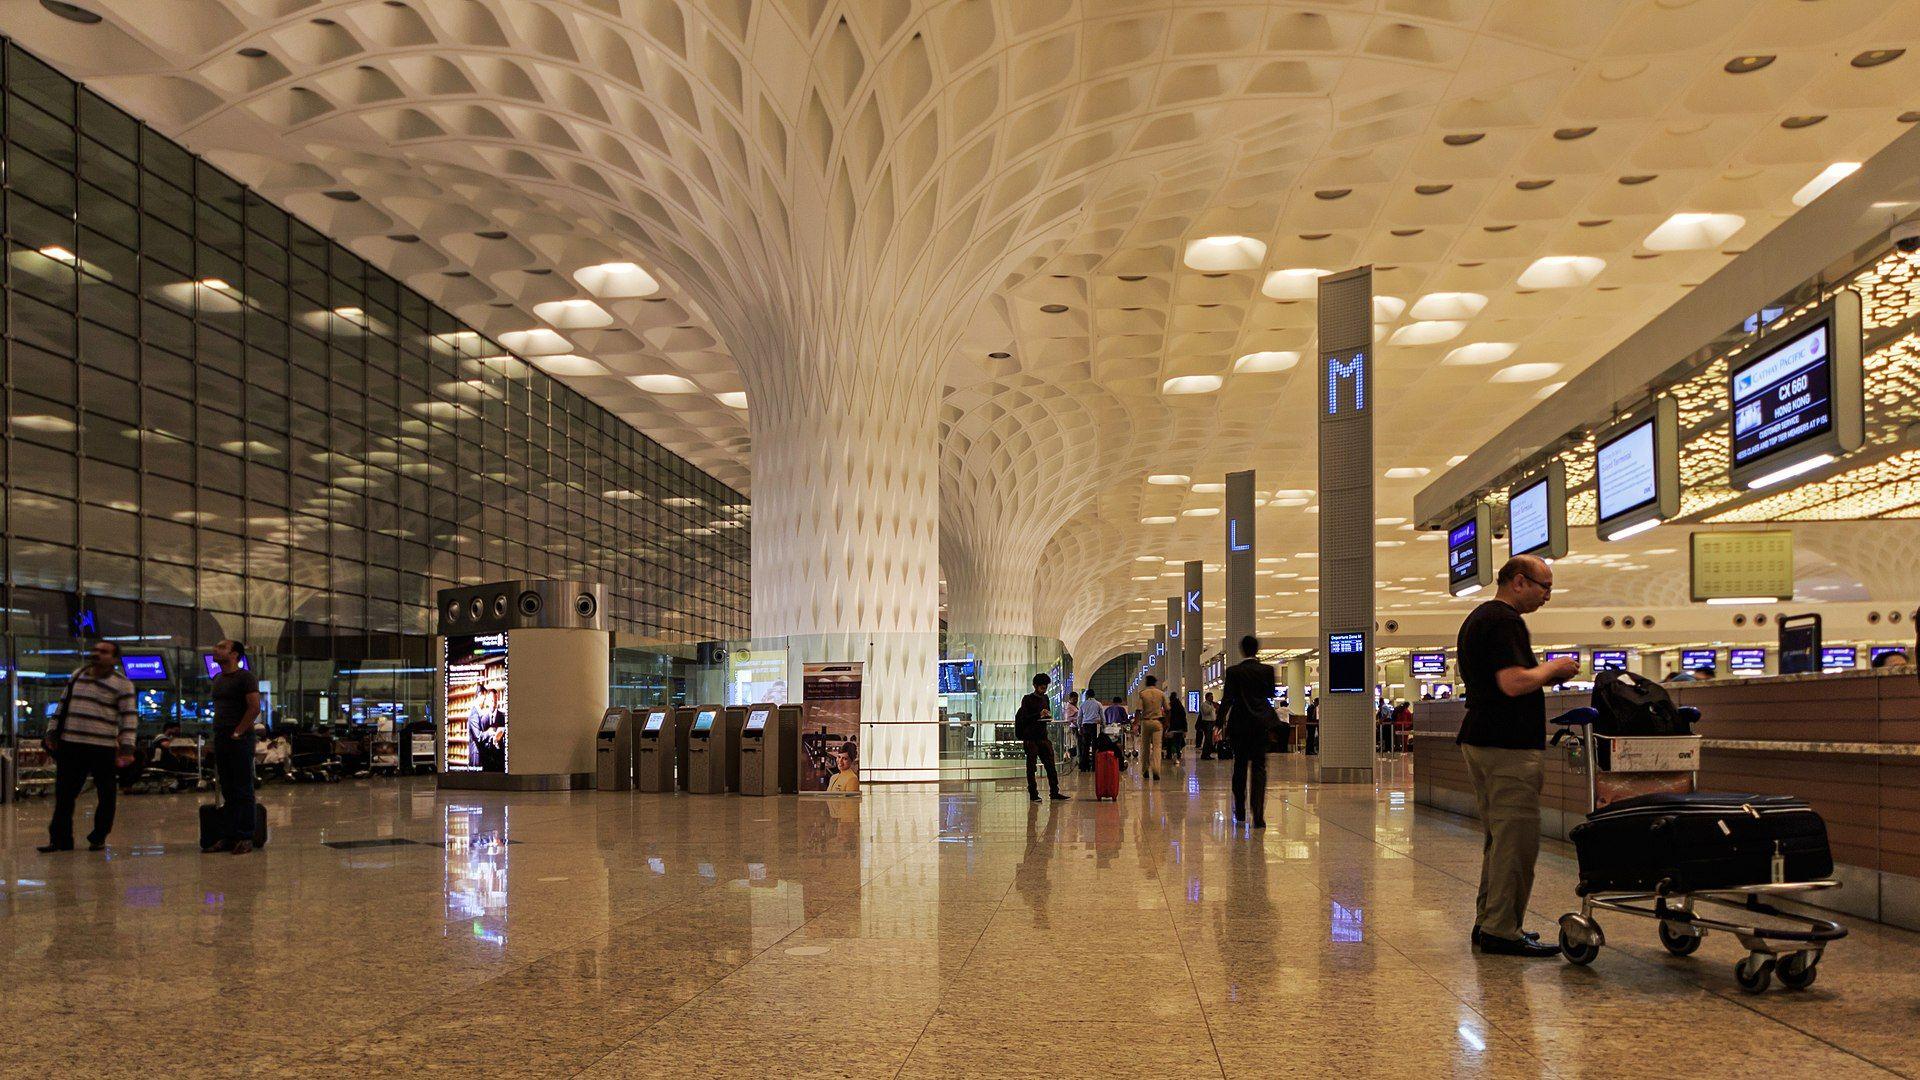 Mumbai 032016 114 Airport international terminal interior